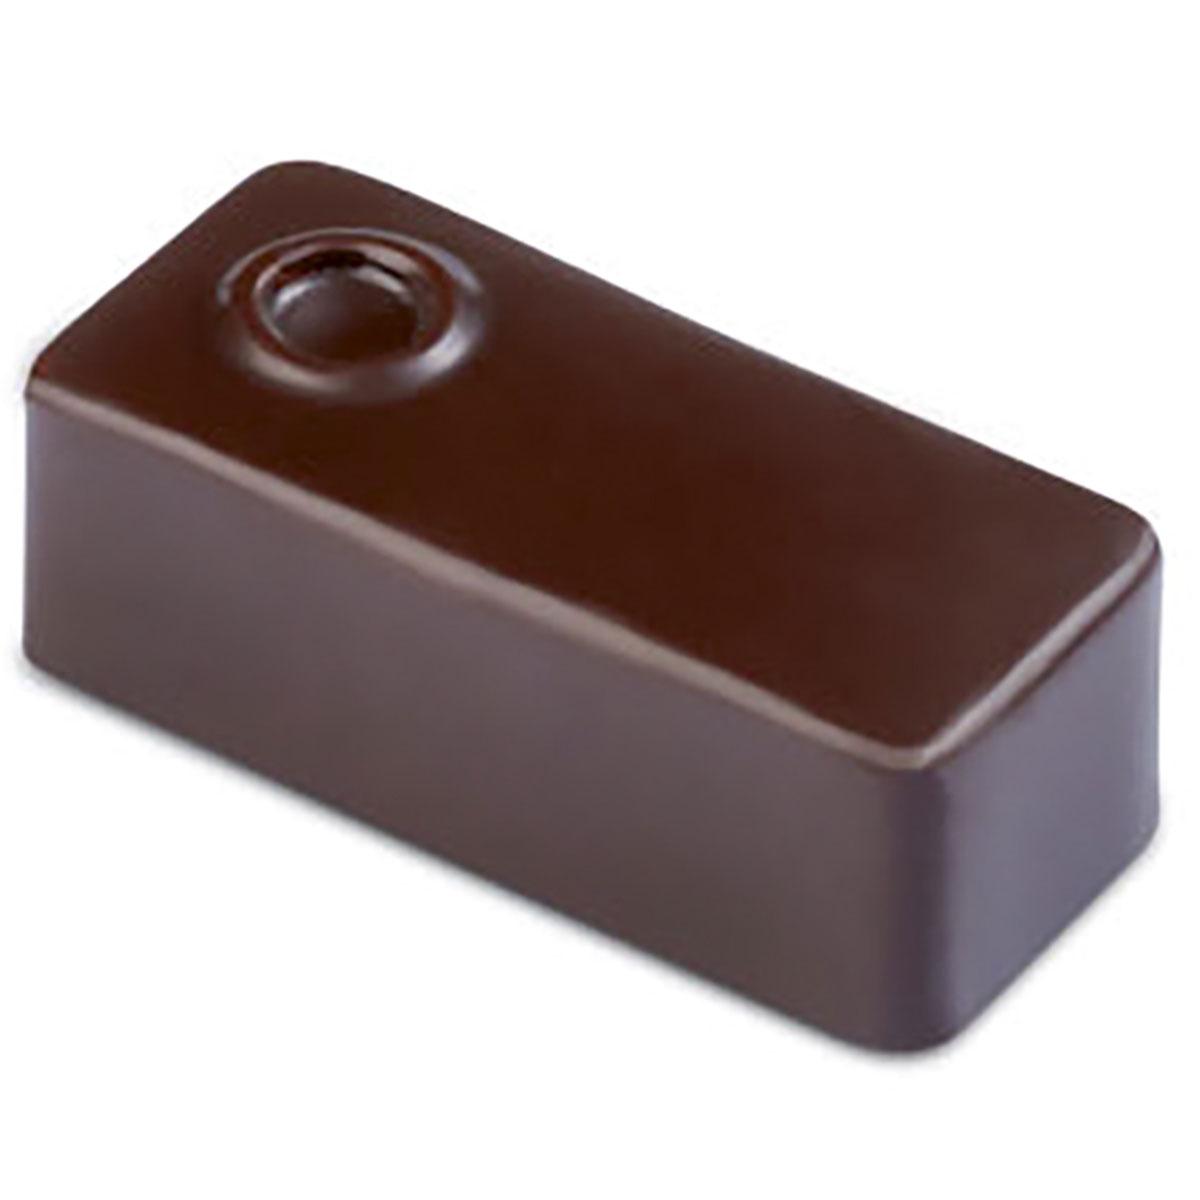 Billede af H. W. Larsen chokoladeform - Pavoni - Model 8PC108